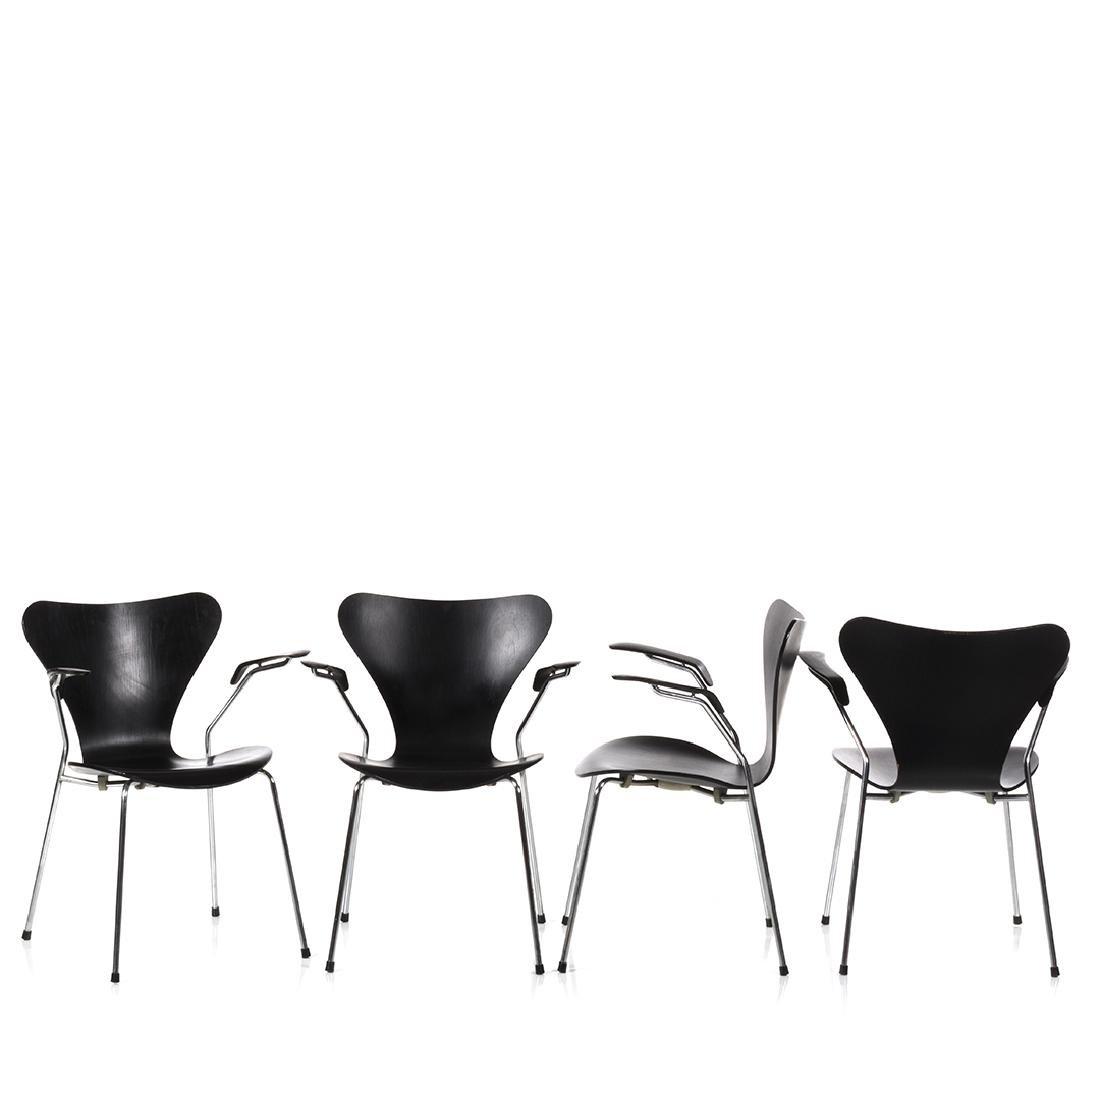 Arne Jacobsen Armchairs (6) - 2